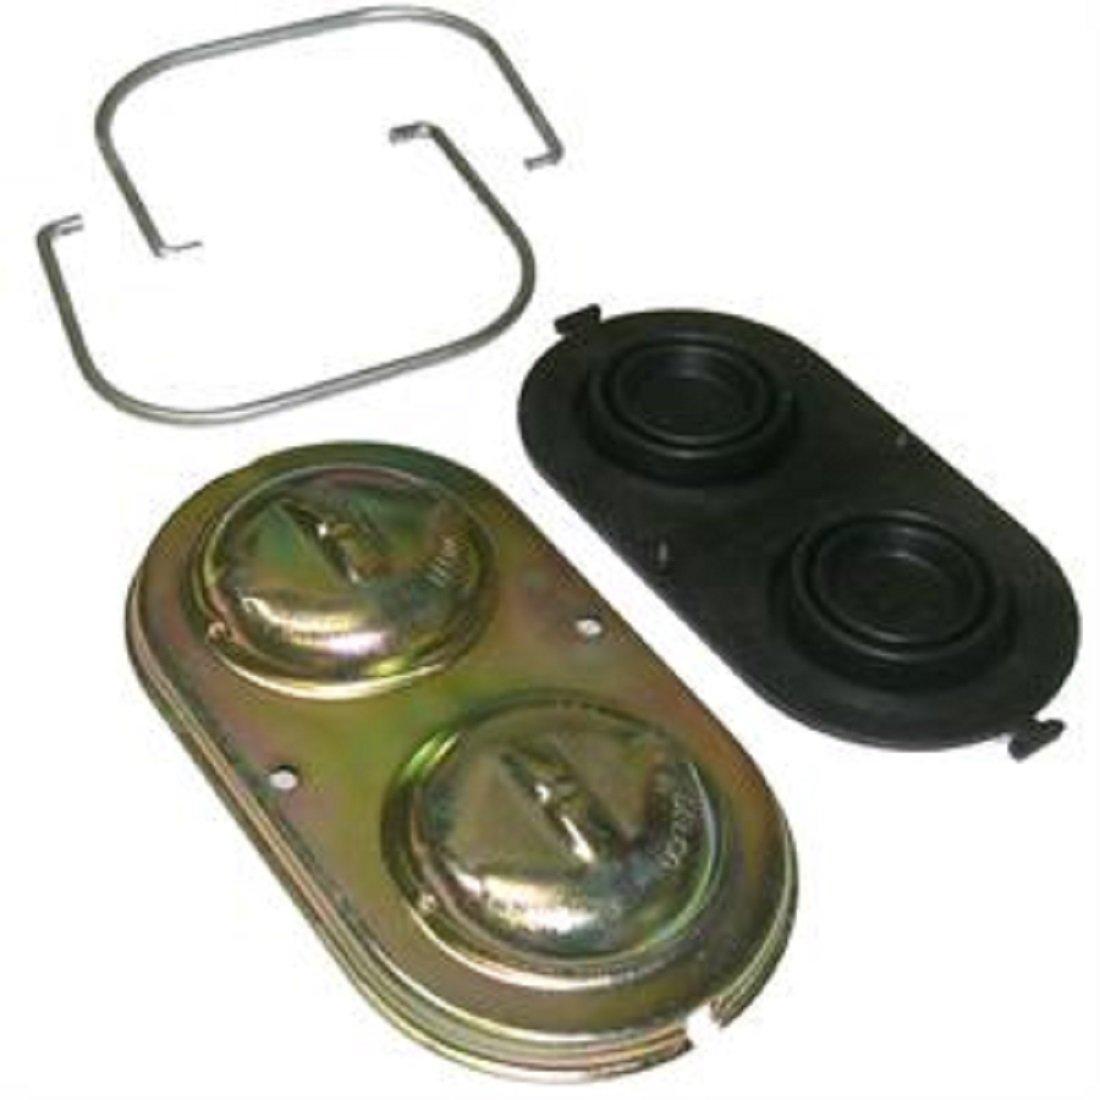 Bails /& Gasket 1967 CORVETTE Correct Reproduction Master Cylinder Cap